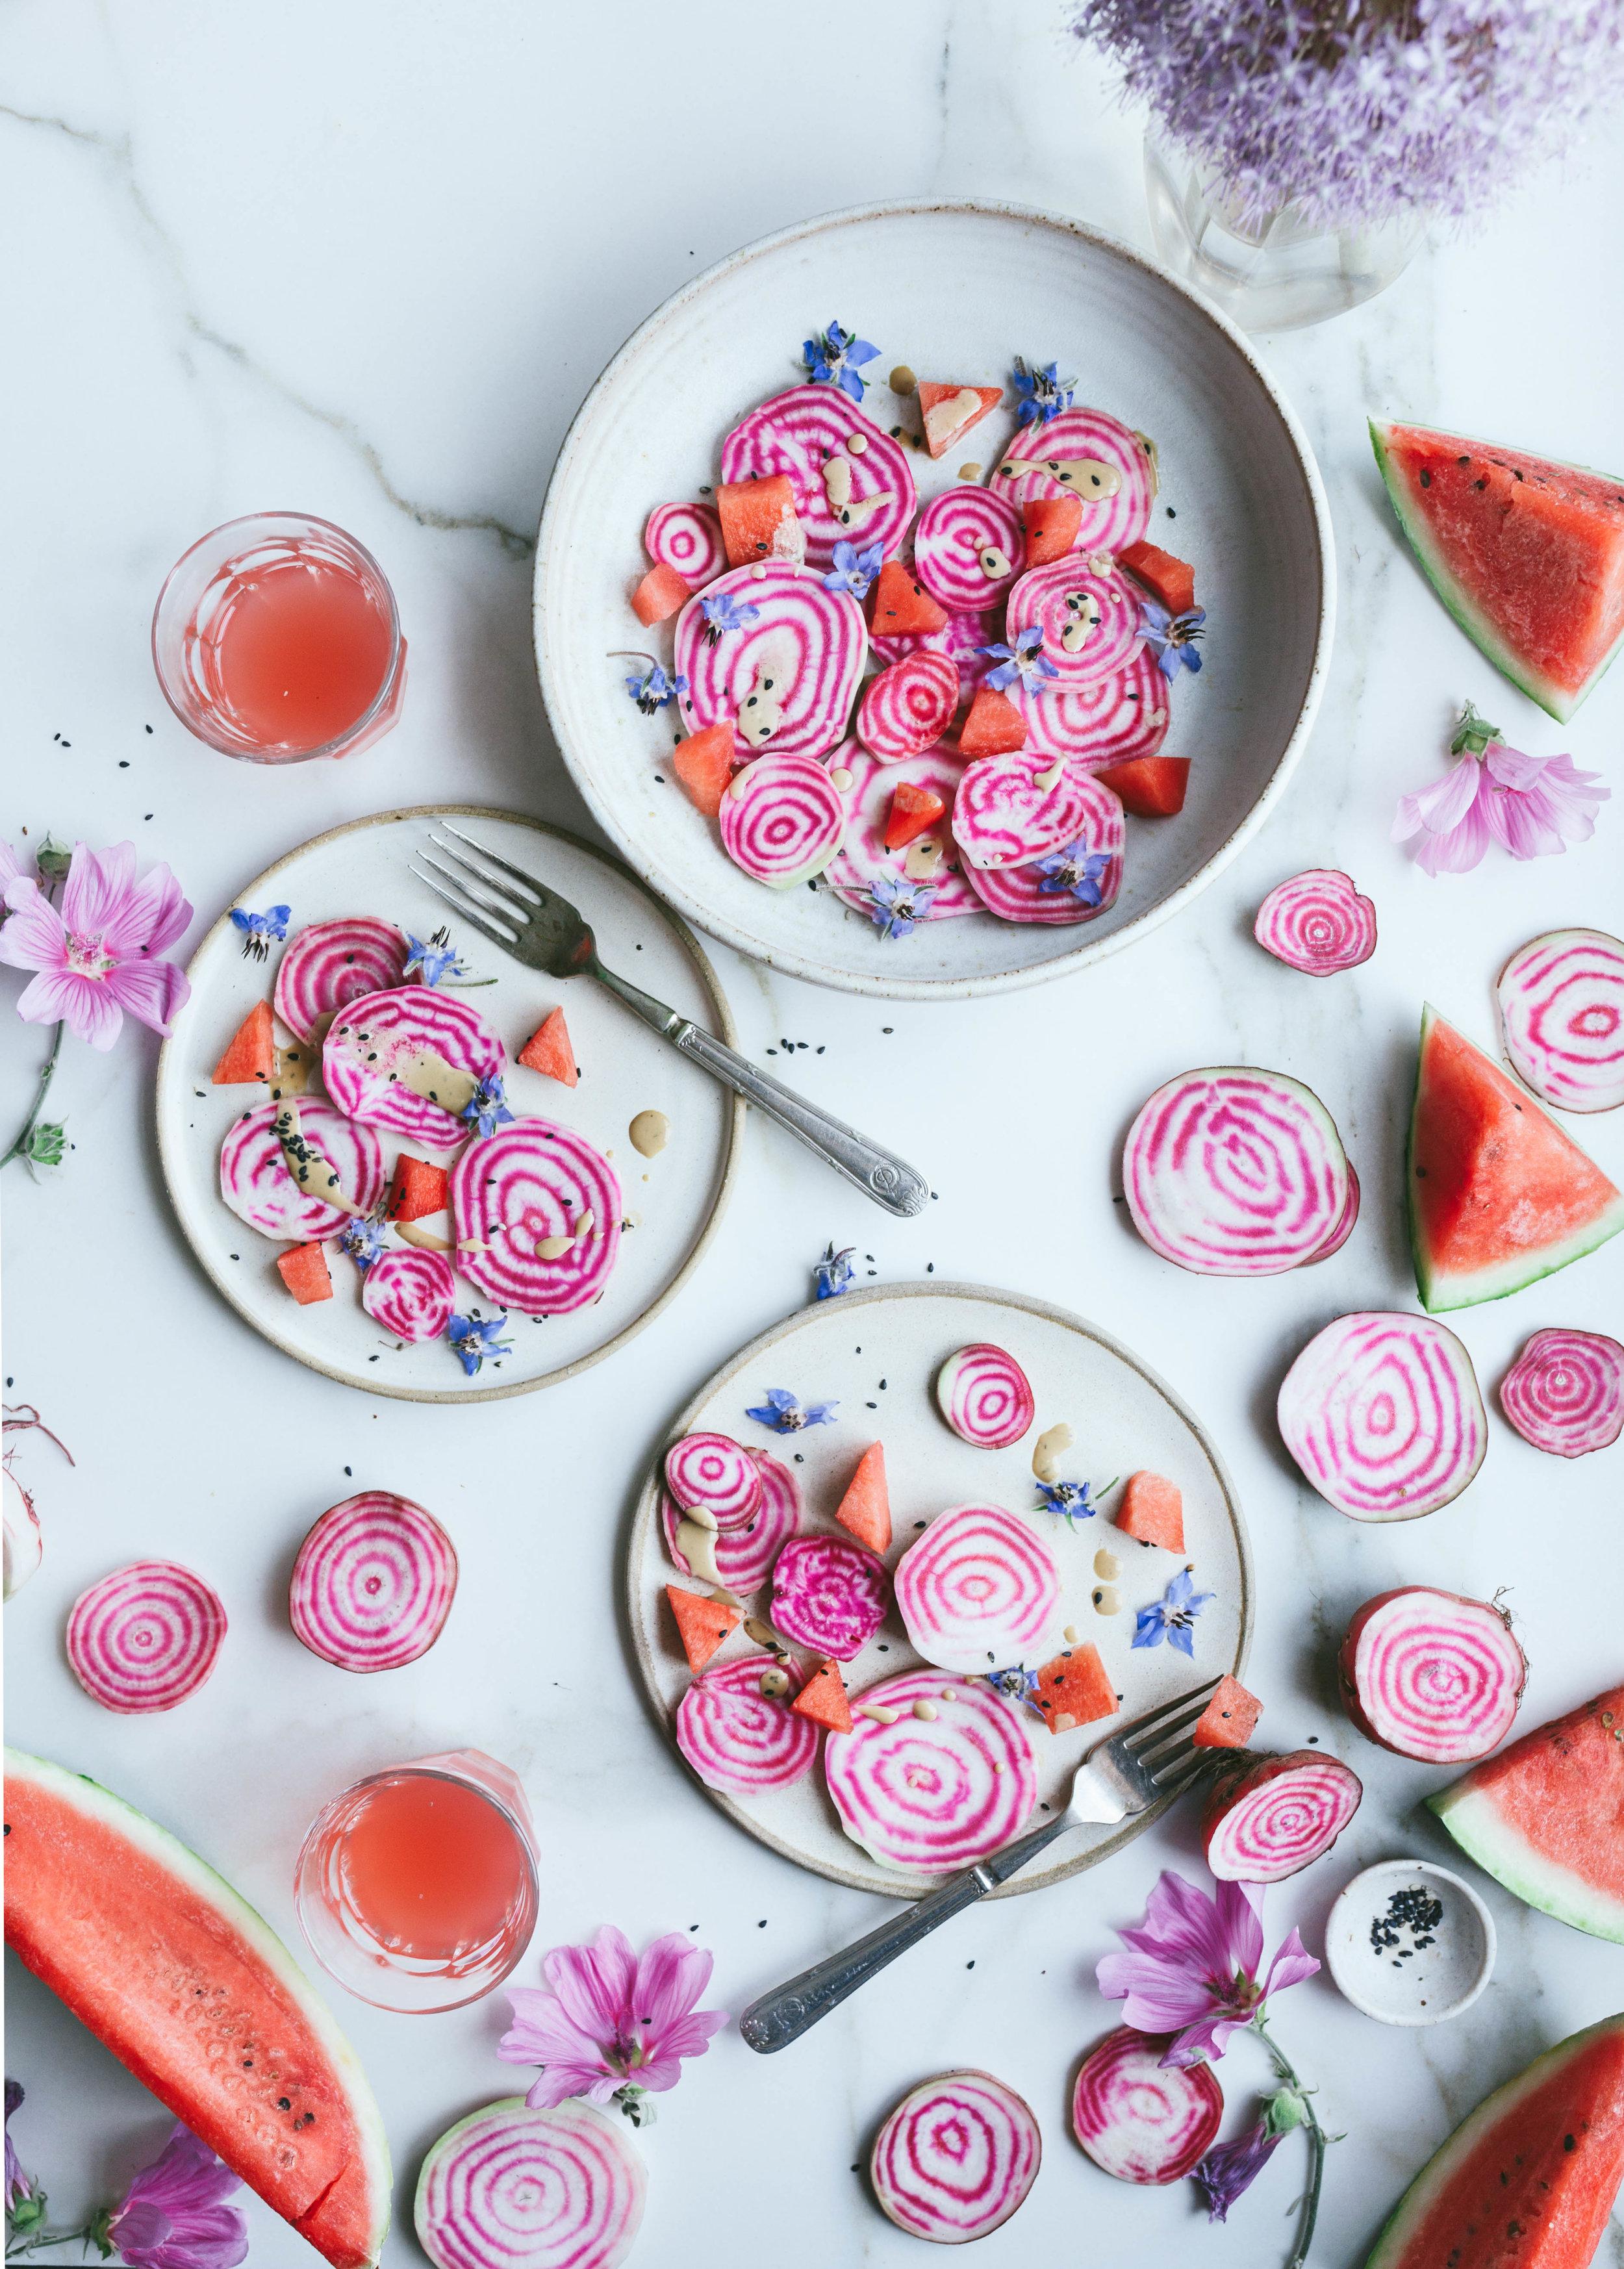 Watermelon beetroot summer salad+ Nourish Atelier cookbook giveaway - The Little Plantation